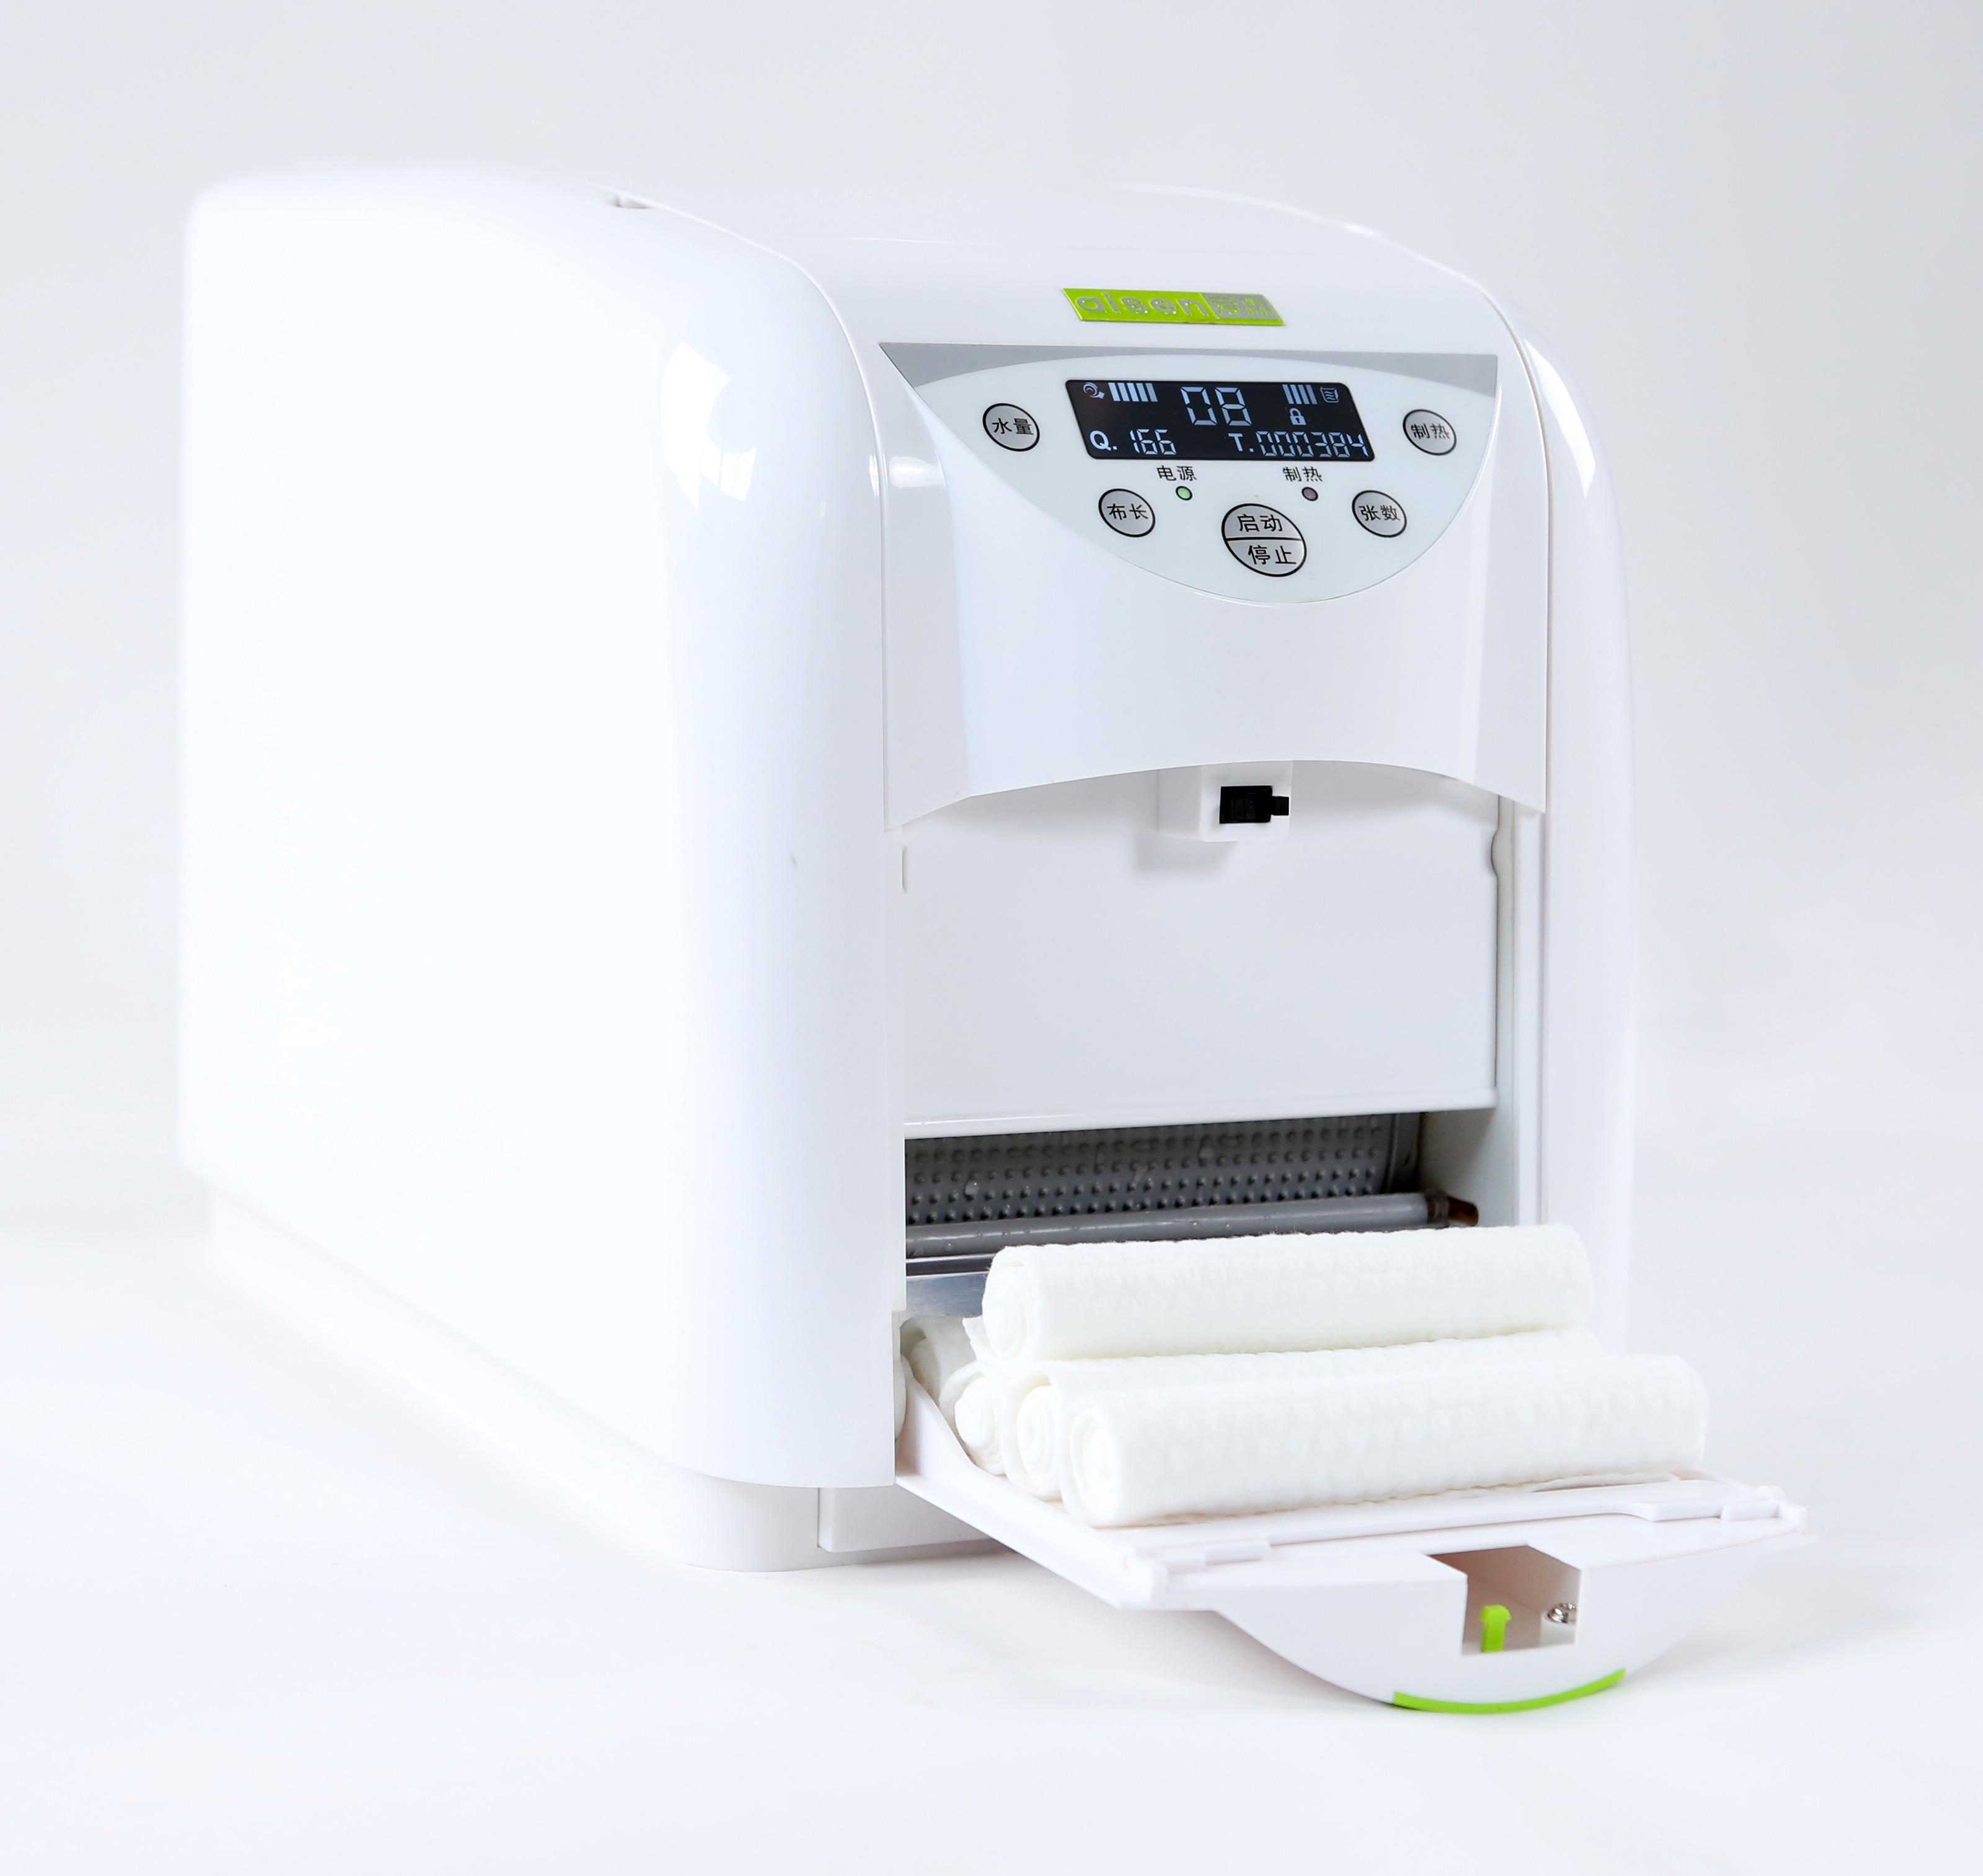 Диспенсер для полотенец SJJ-120B микро программируемый с ЖК-дисплеем уход за кожей мягкое полотенце нетканое полотенце